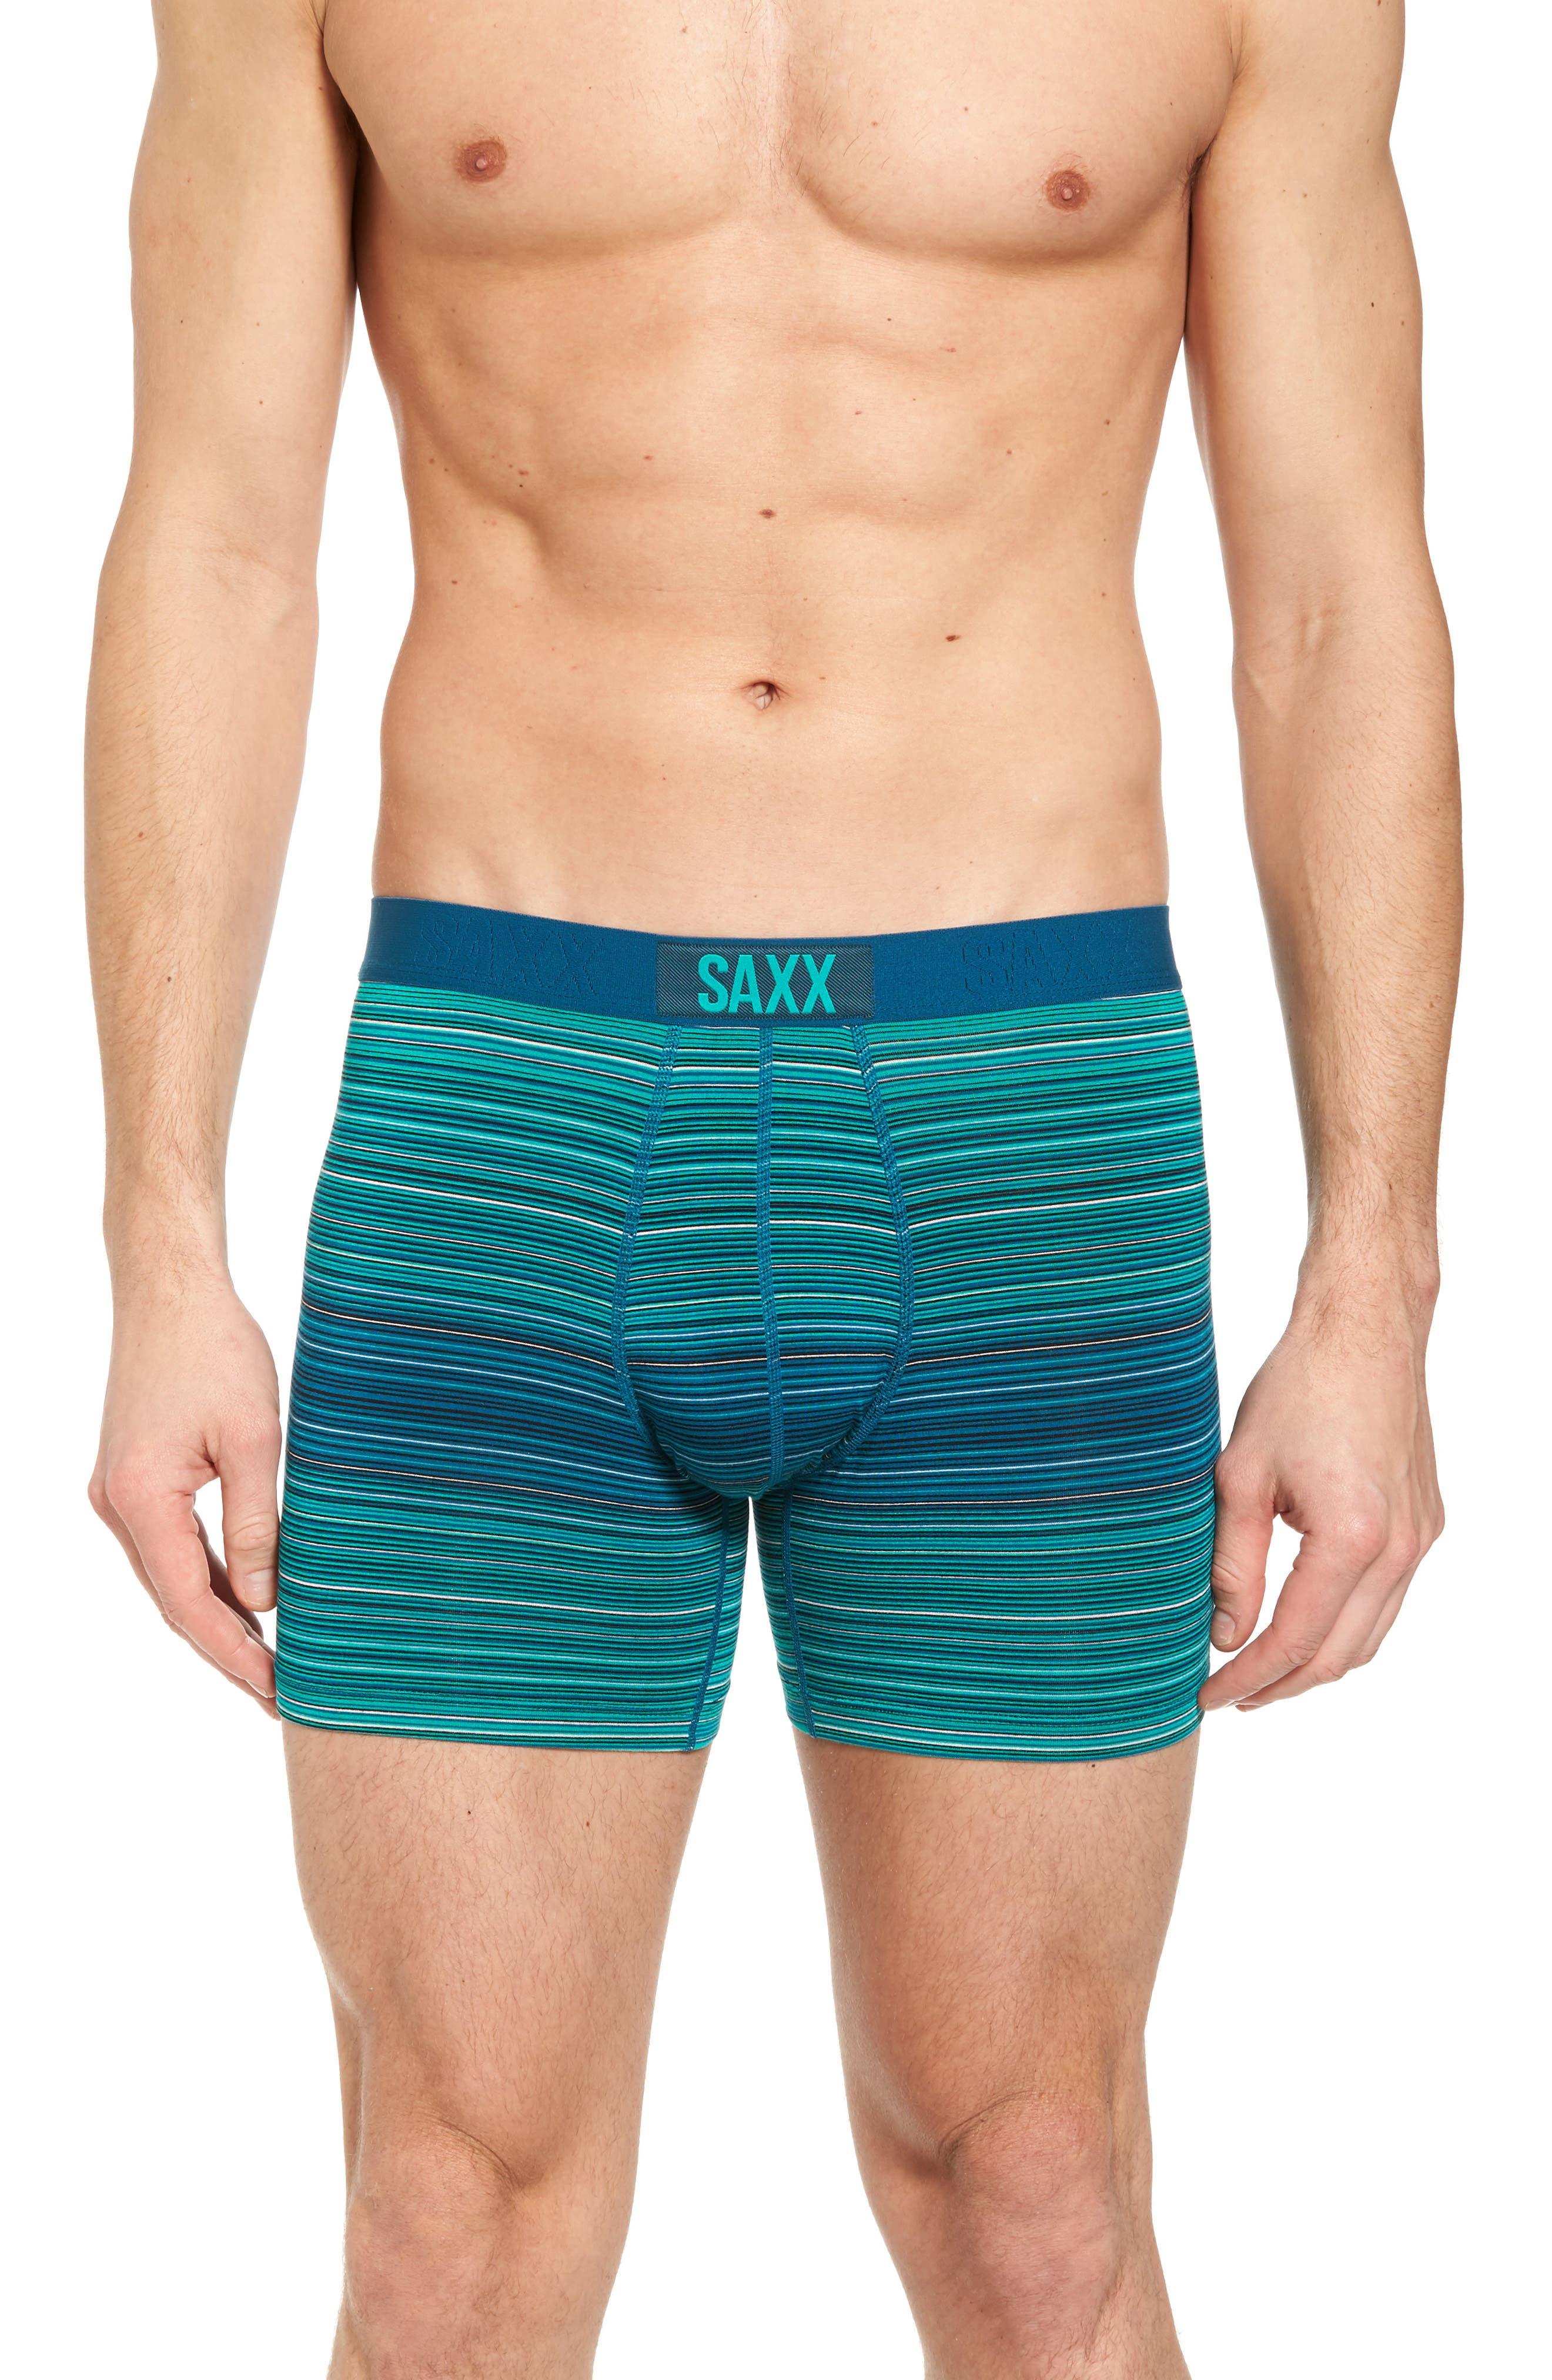 Vibe Boxer Briefs,                             Main thumbnail 1, color,                             Ocean Binding Stripe